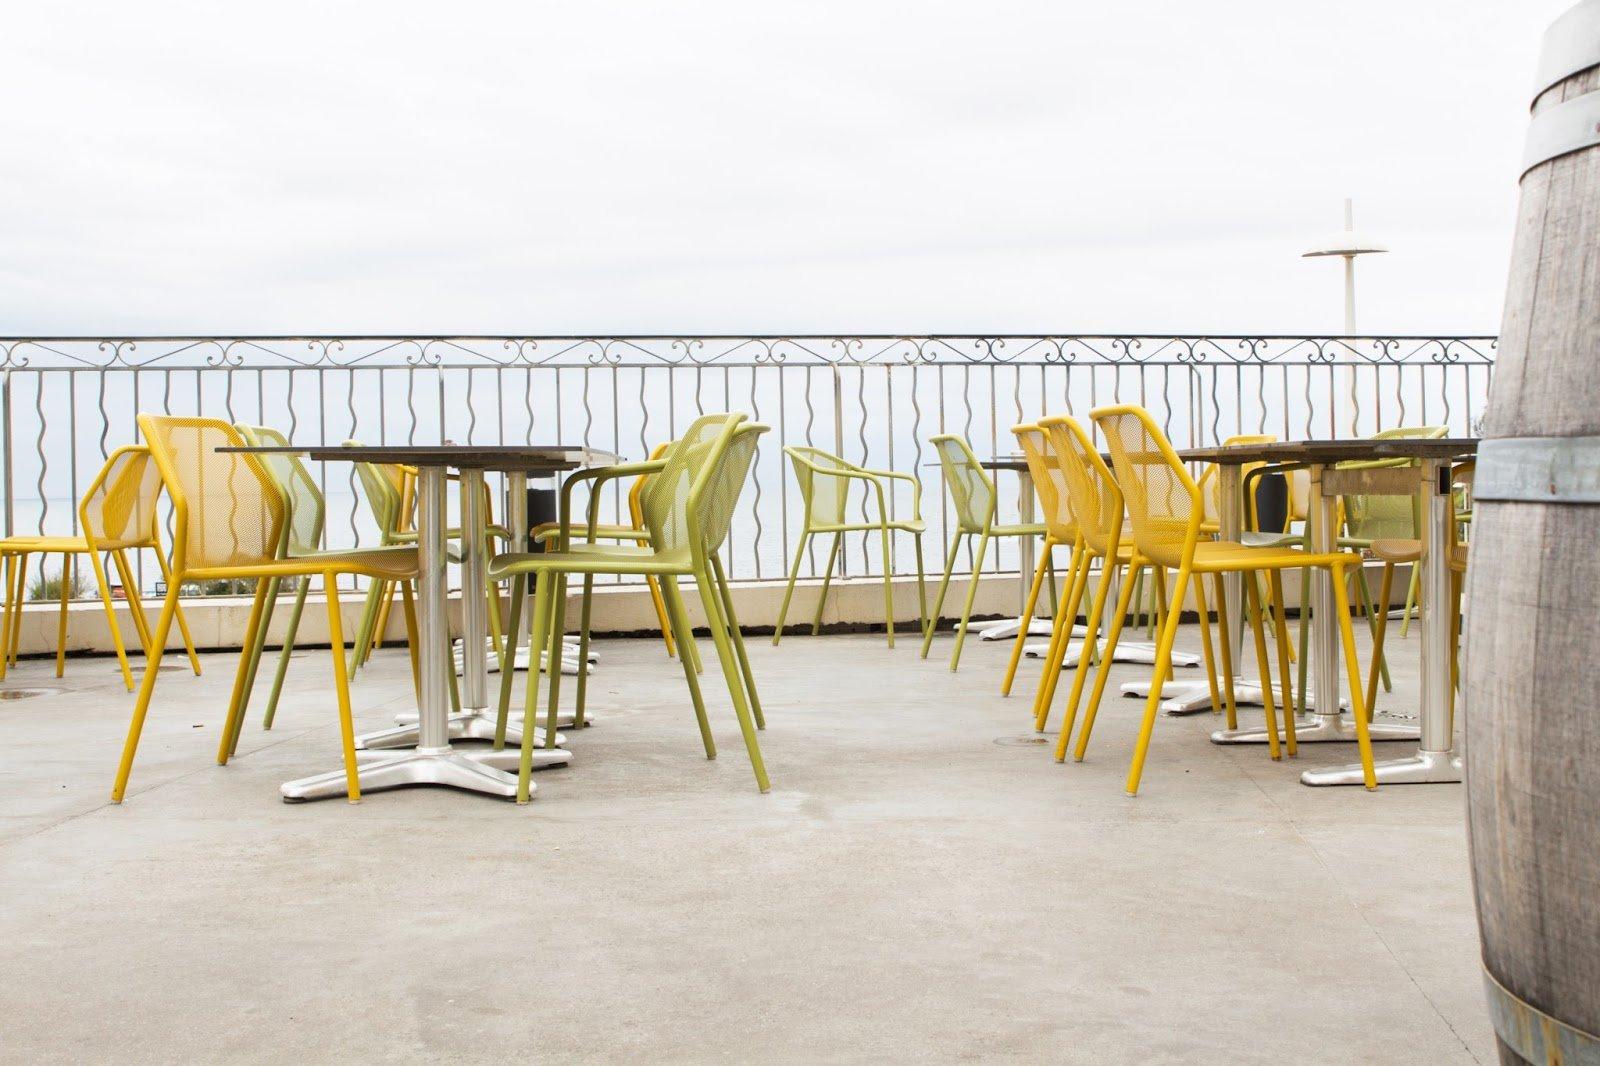 Les Baigneuses bar terrasse